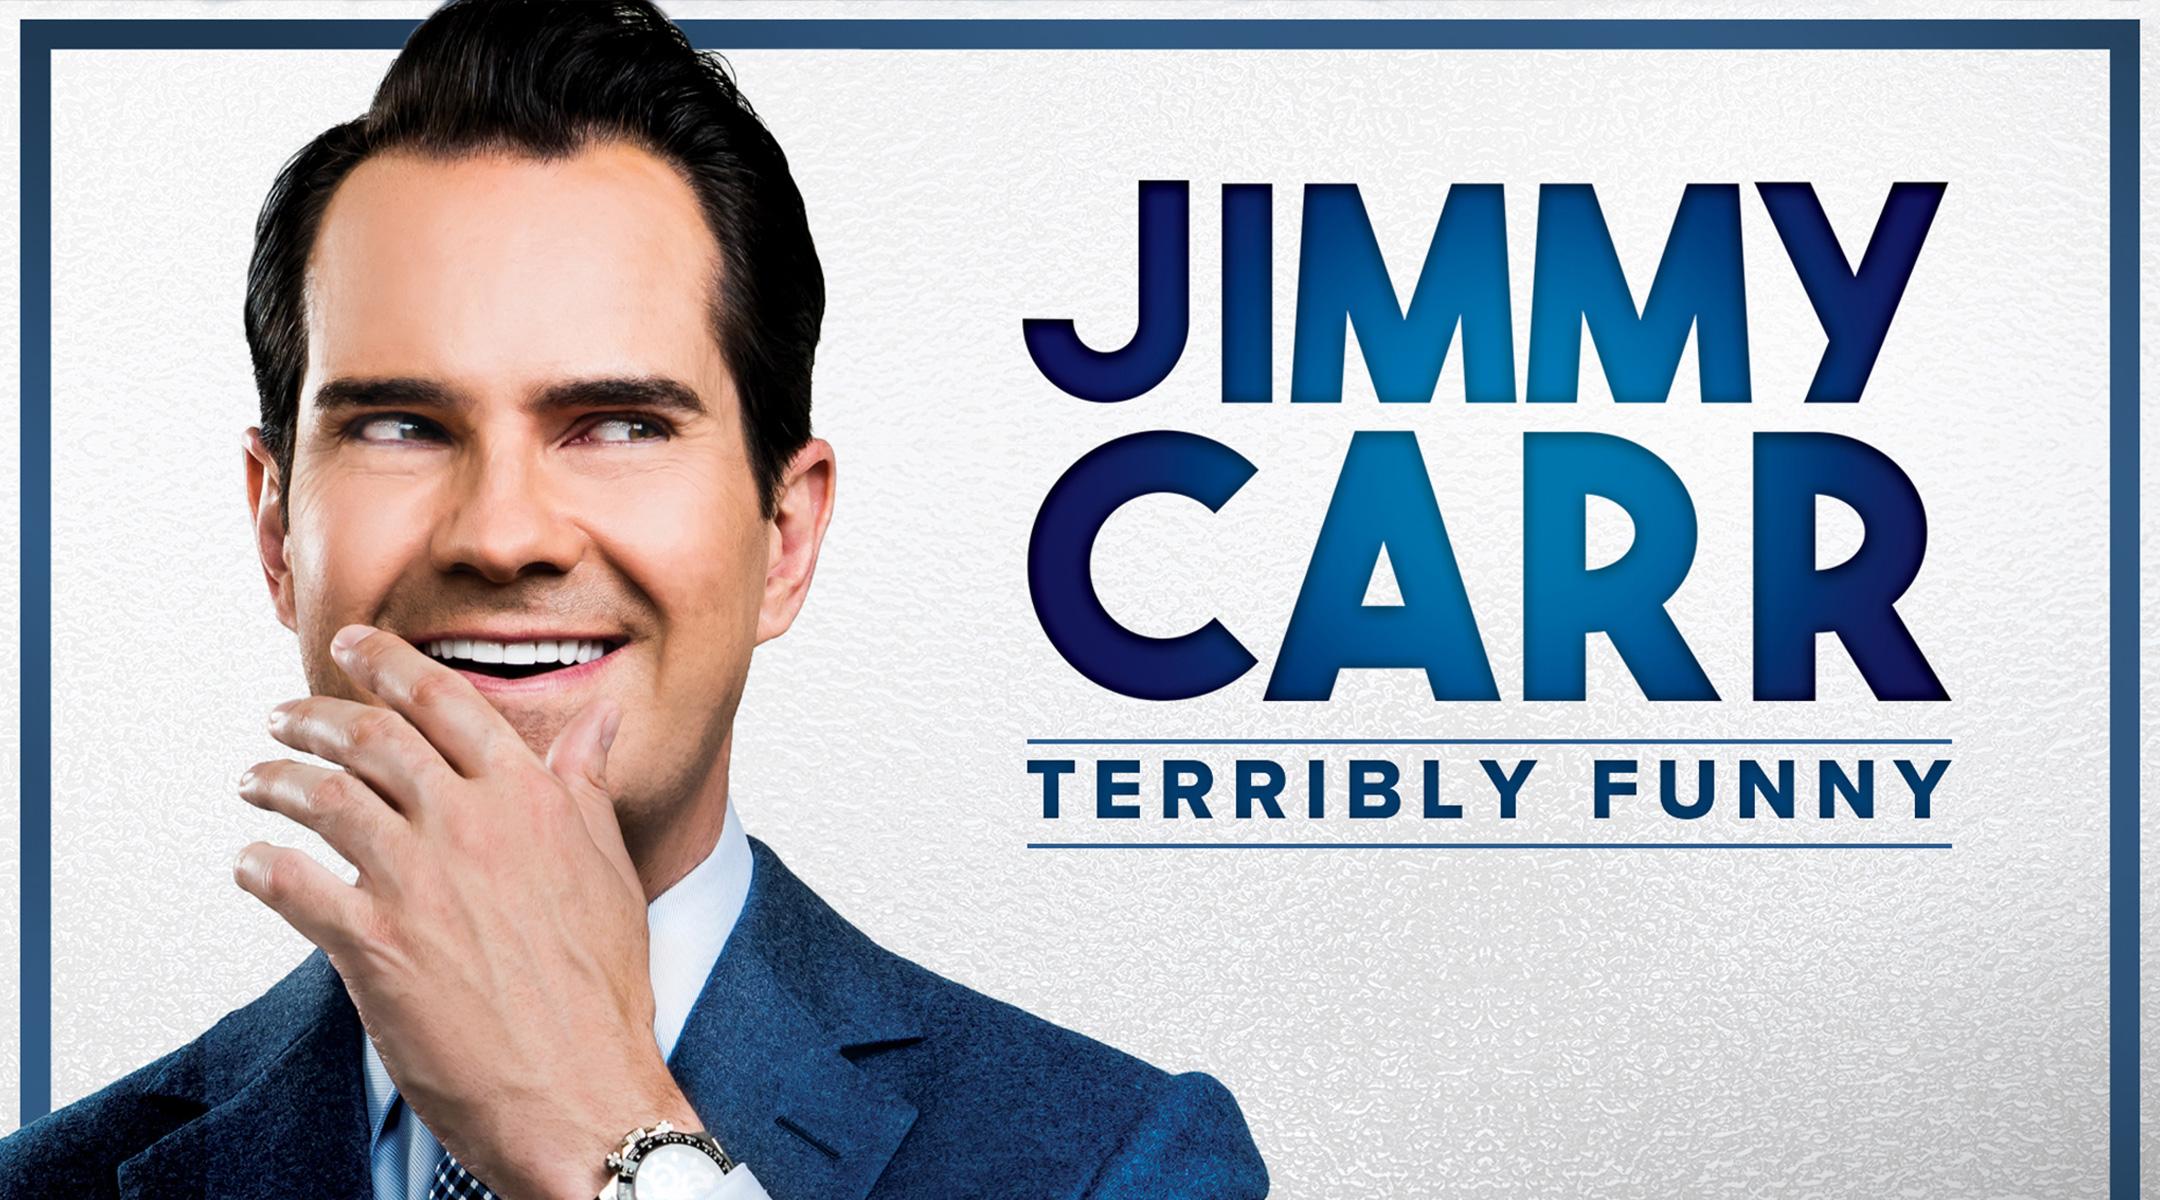 Jimmy Carr: Terribly Funny - Barnstaple - Early Show